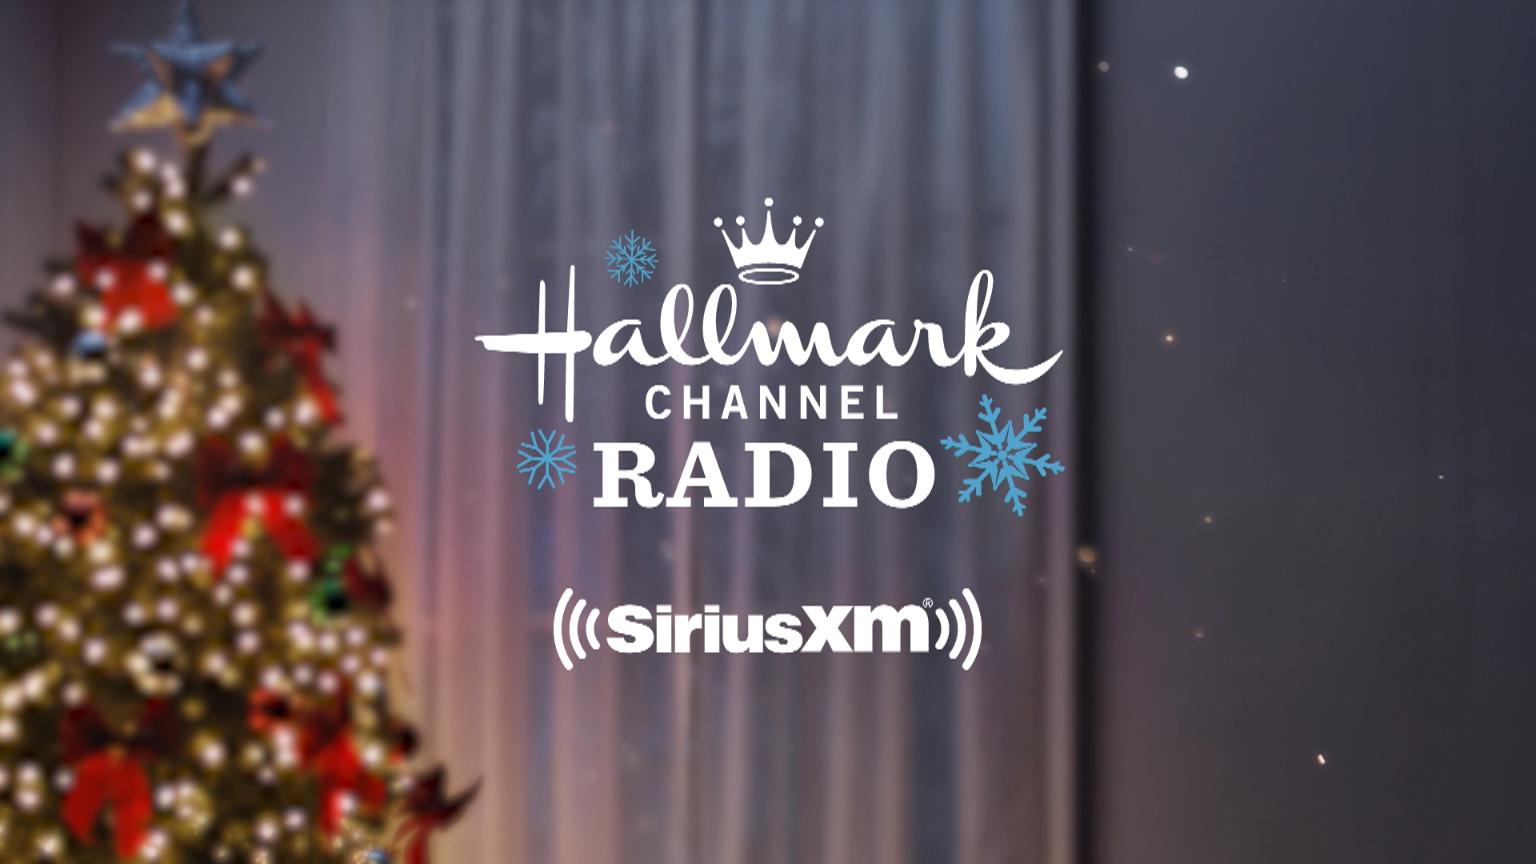 Siriusxm Christmas Stations 2019.Tune Into Hallmark Channel Radio On Siriusxm Channel 70 To